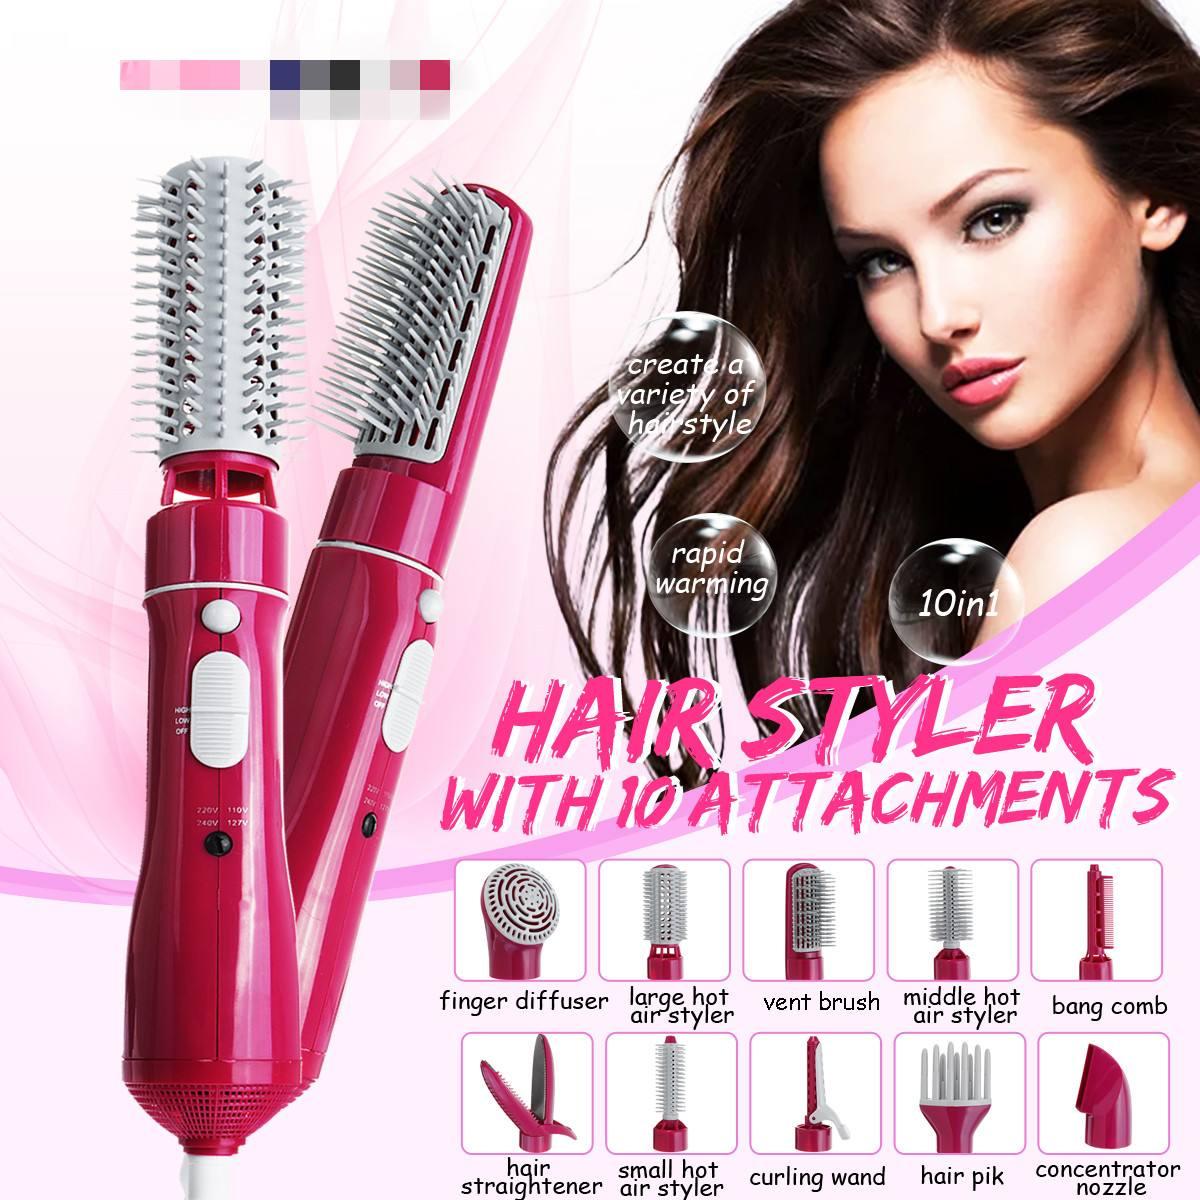 10in1 Professional Hair Trockner Schlag Curler 110-220 V Mit Kämme Pinsel Curler Multifunktionale Salon Haar Styling Werkzeug EU stecker